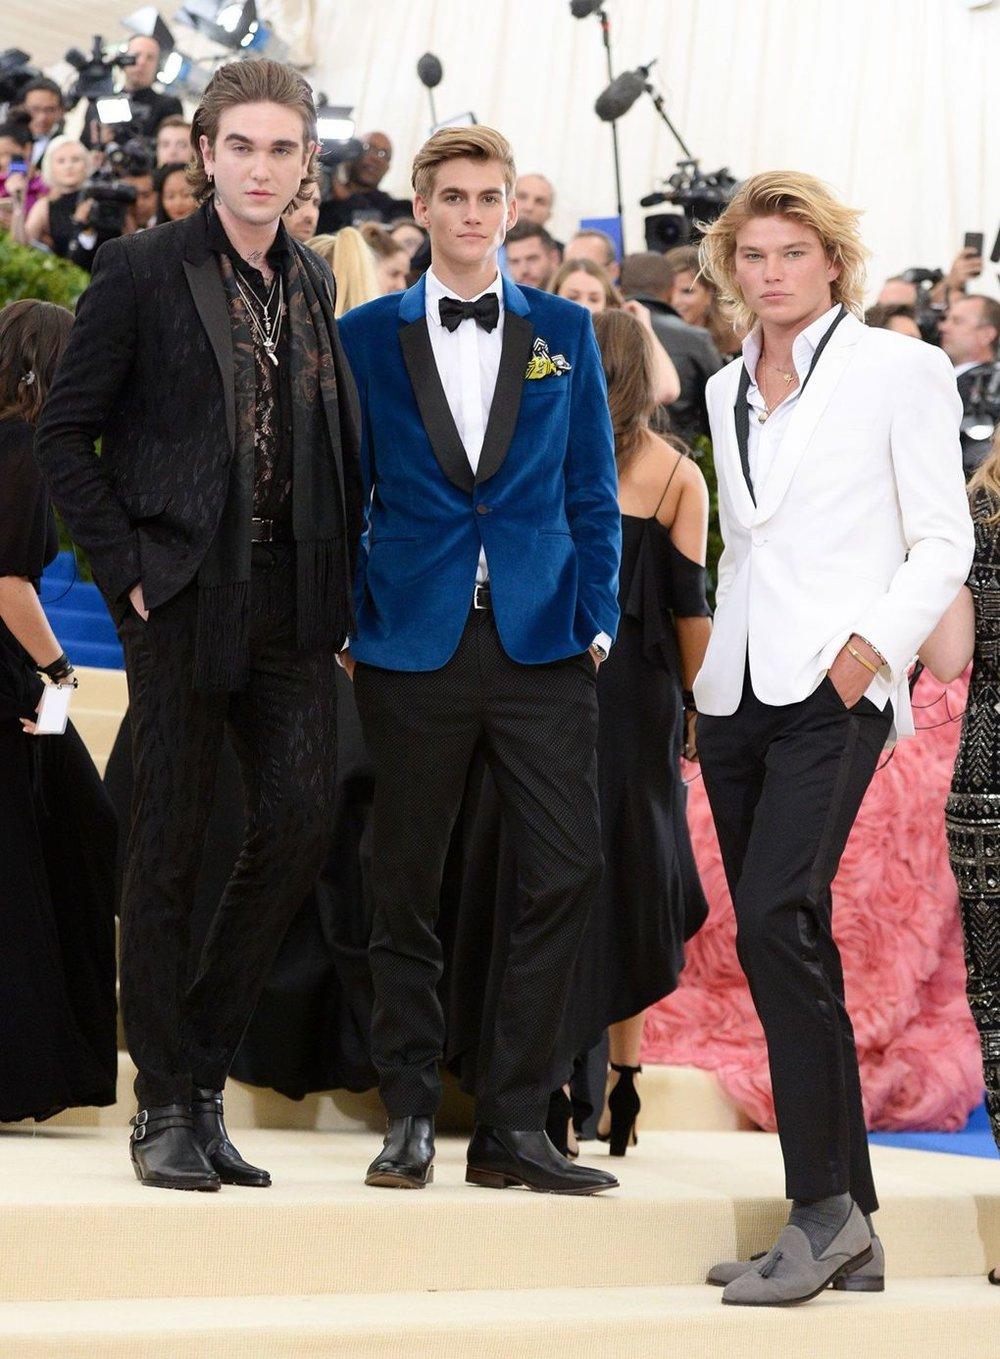 Gabriel-Kane Day-Lewis, Presley Gerber and Jordan Barrett all wearing Topman